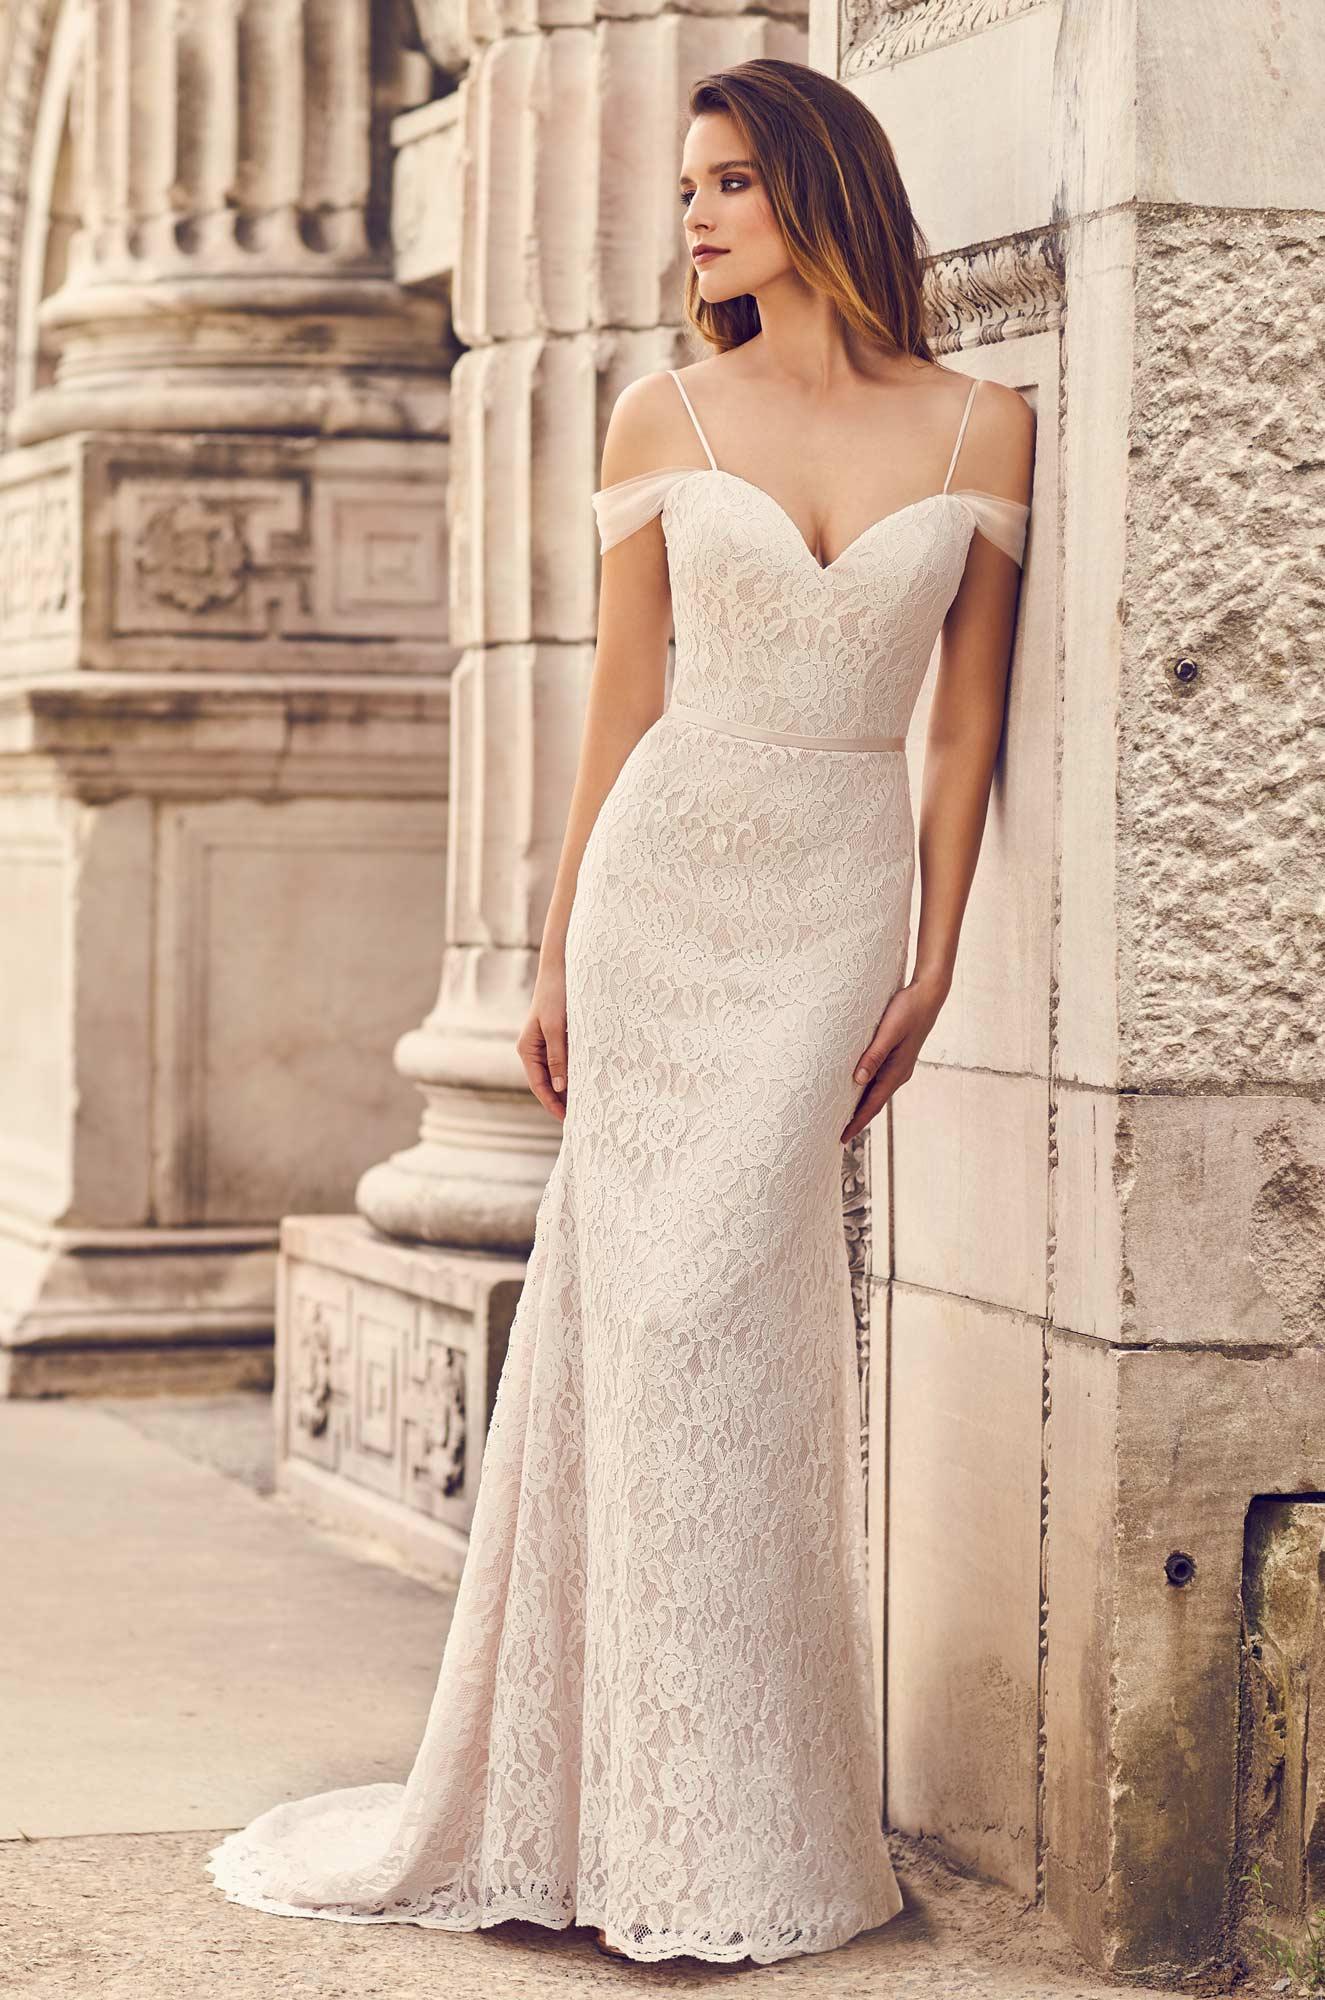 Draped Tulle Sleeve Wedding Dress – Style #2228 | Mikaella Bridal